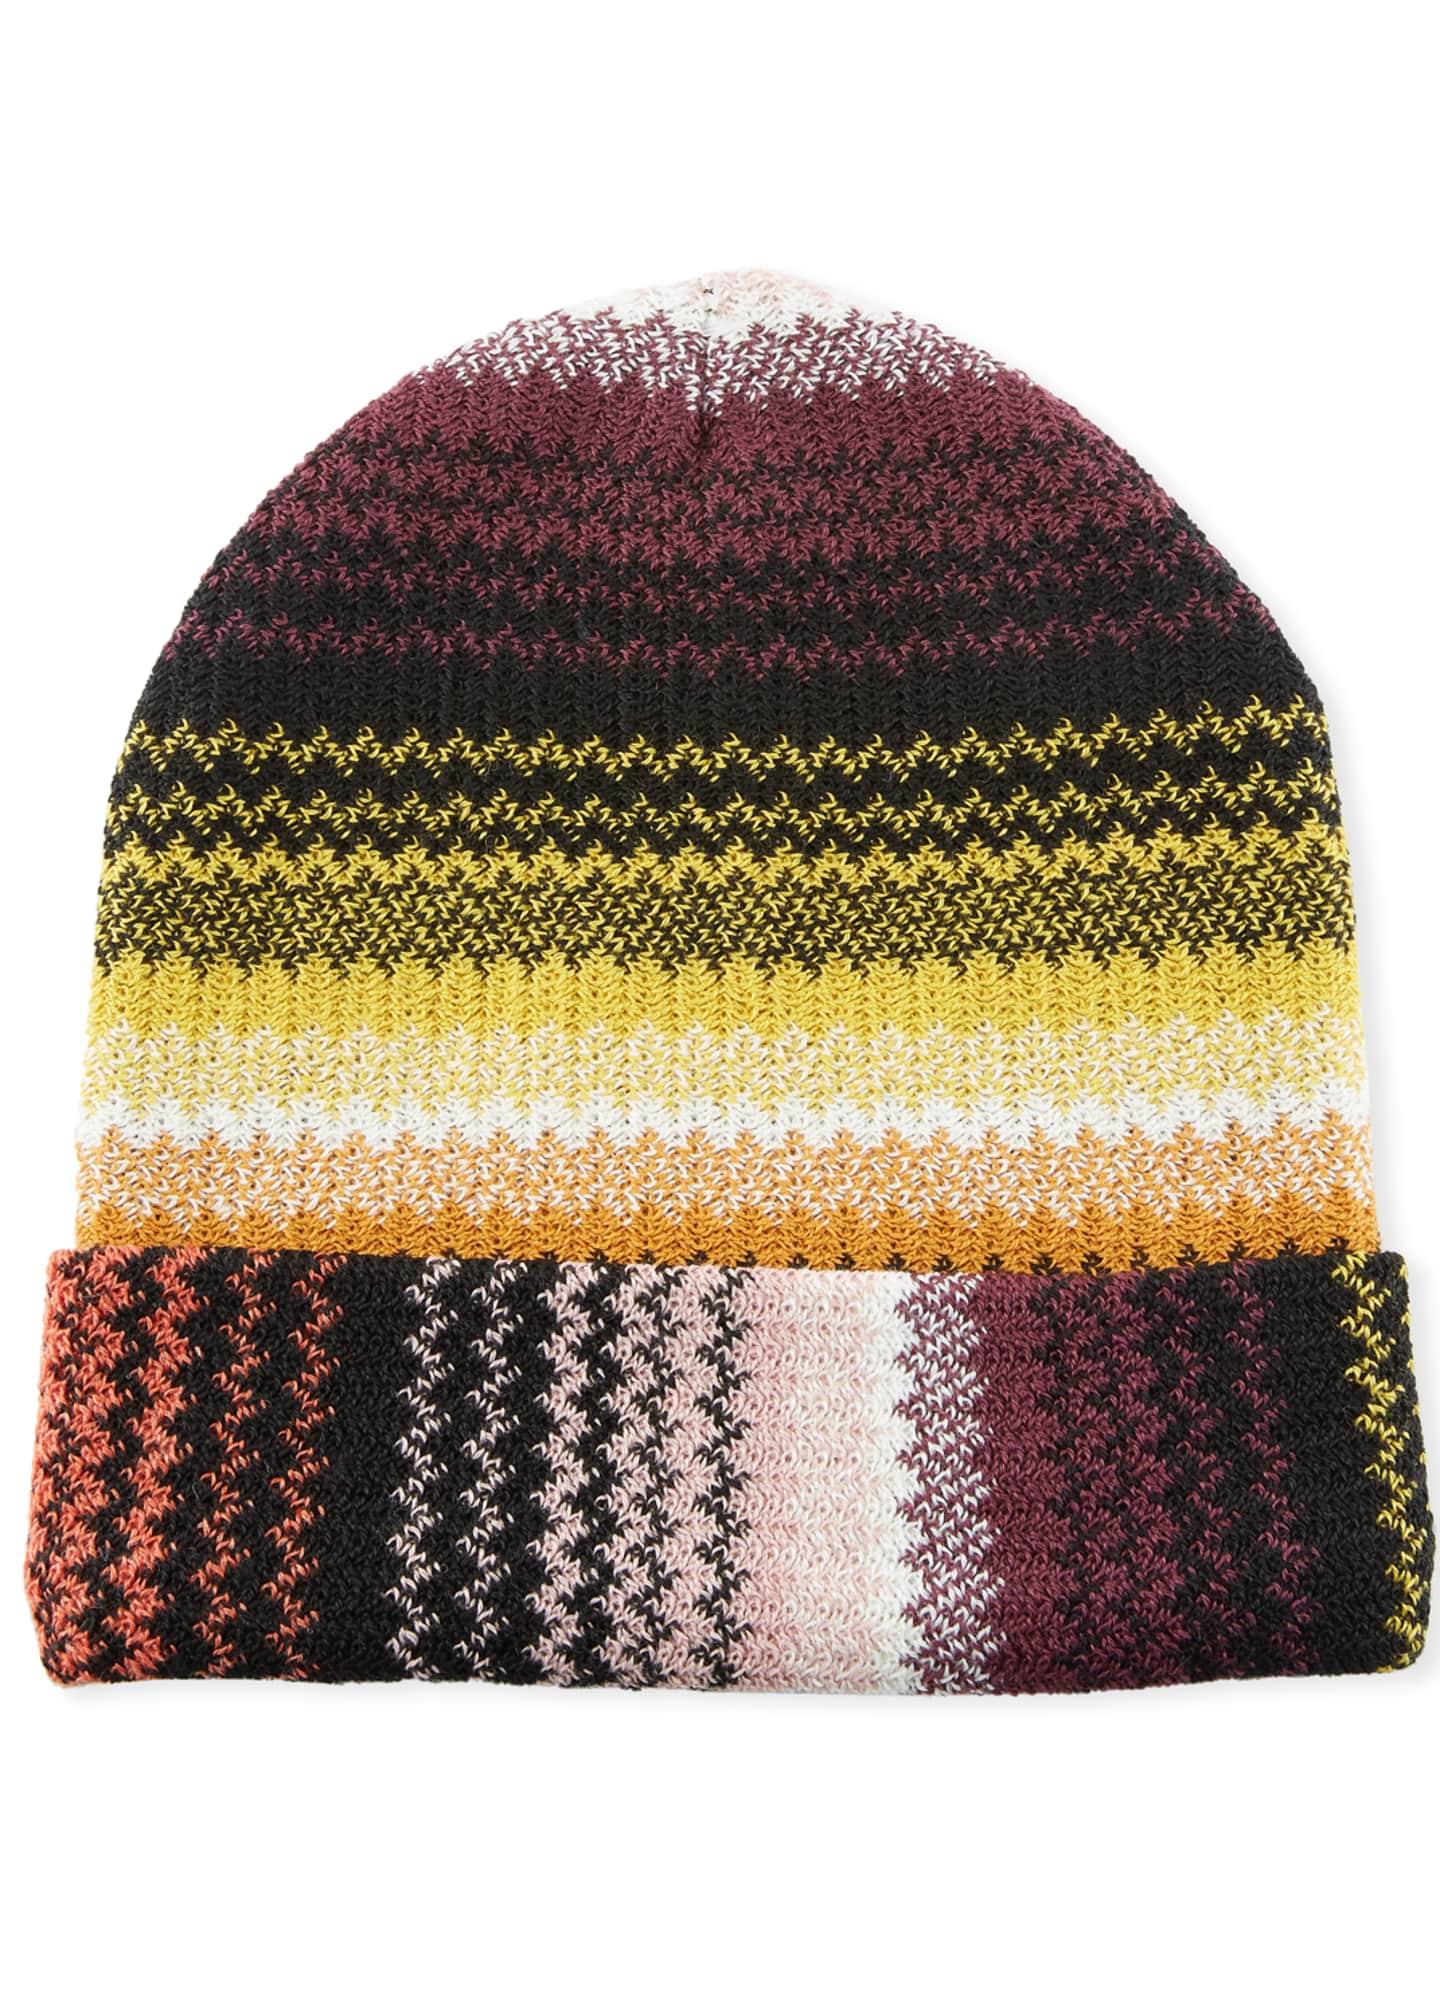 Missoni Accessories Zigzag Wool-Blend Beanie Hat